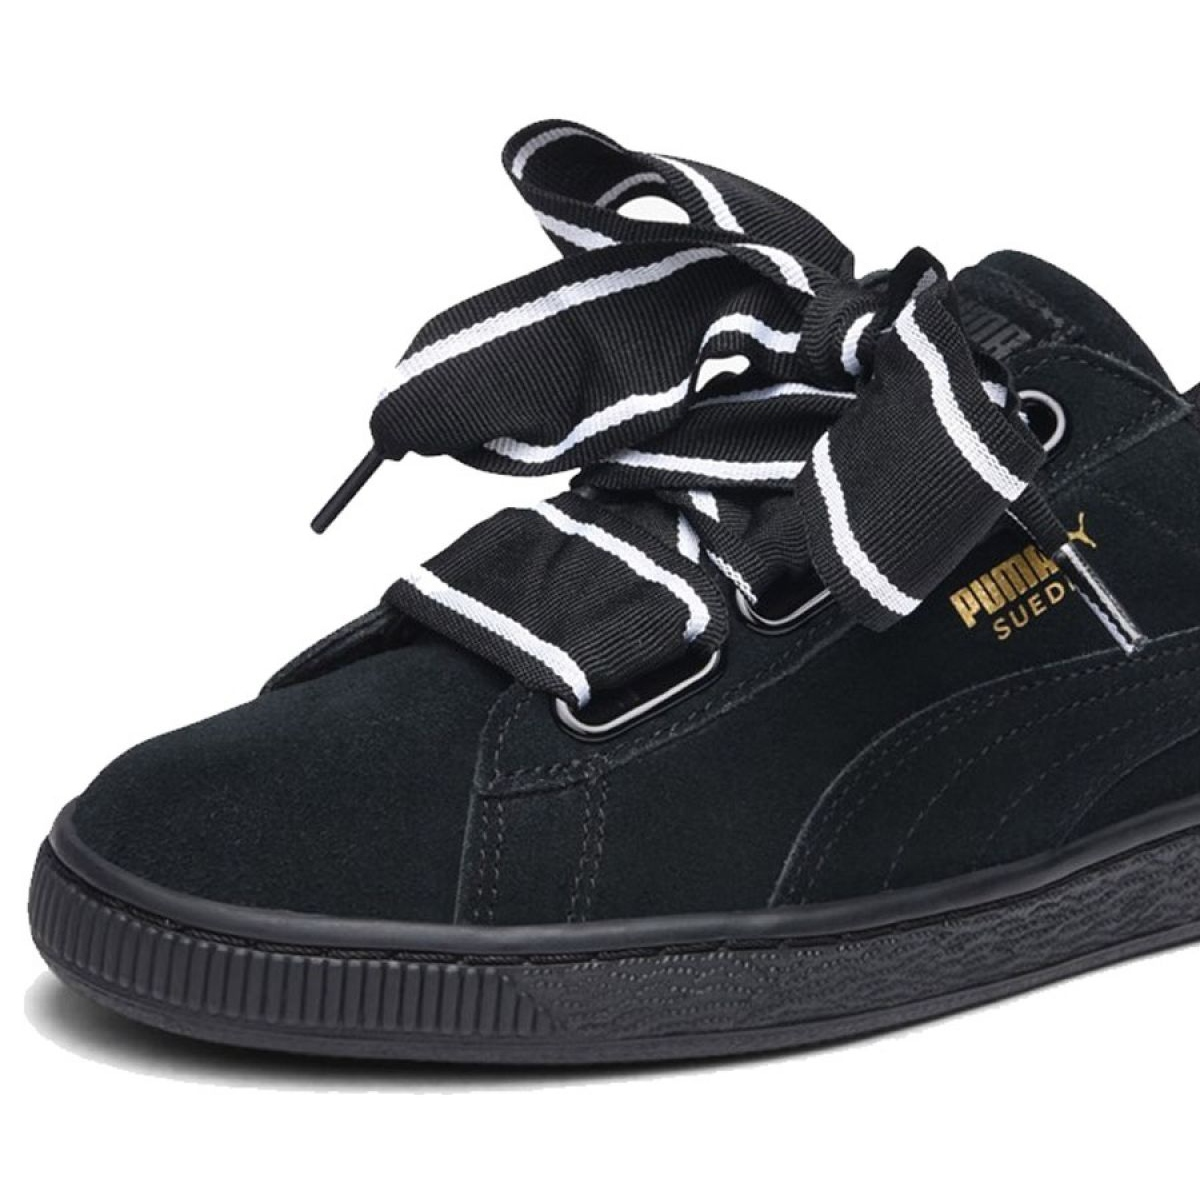 size 40 c9315 e67c3 Black Shoes Puma Suede Heart Satin Ii W 364084 01